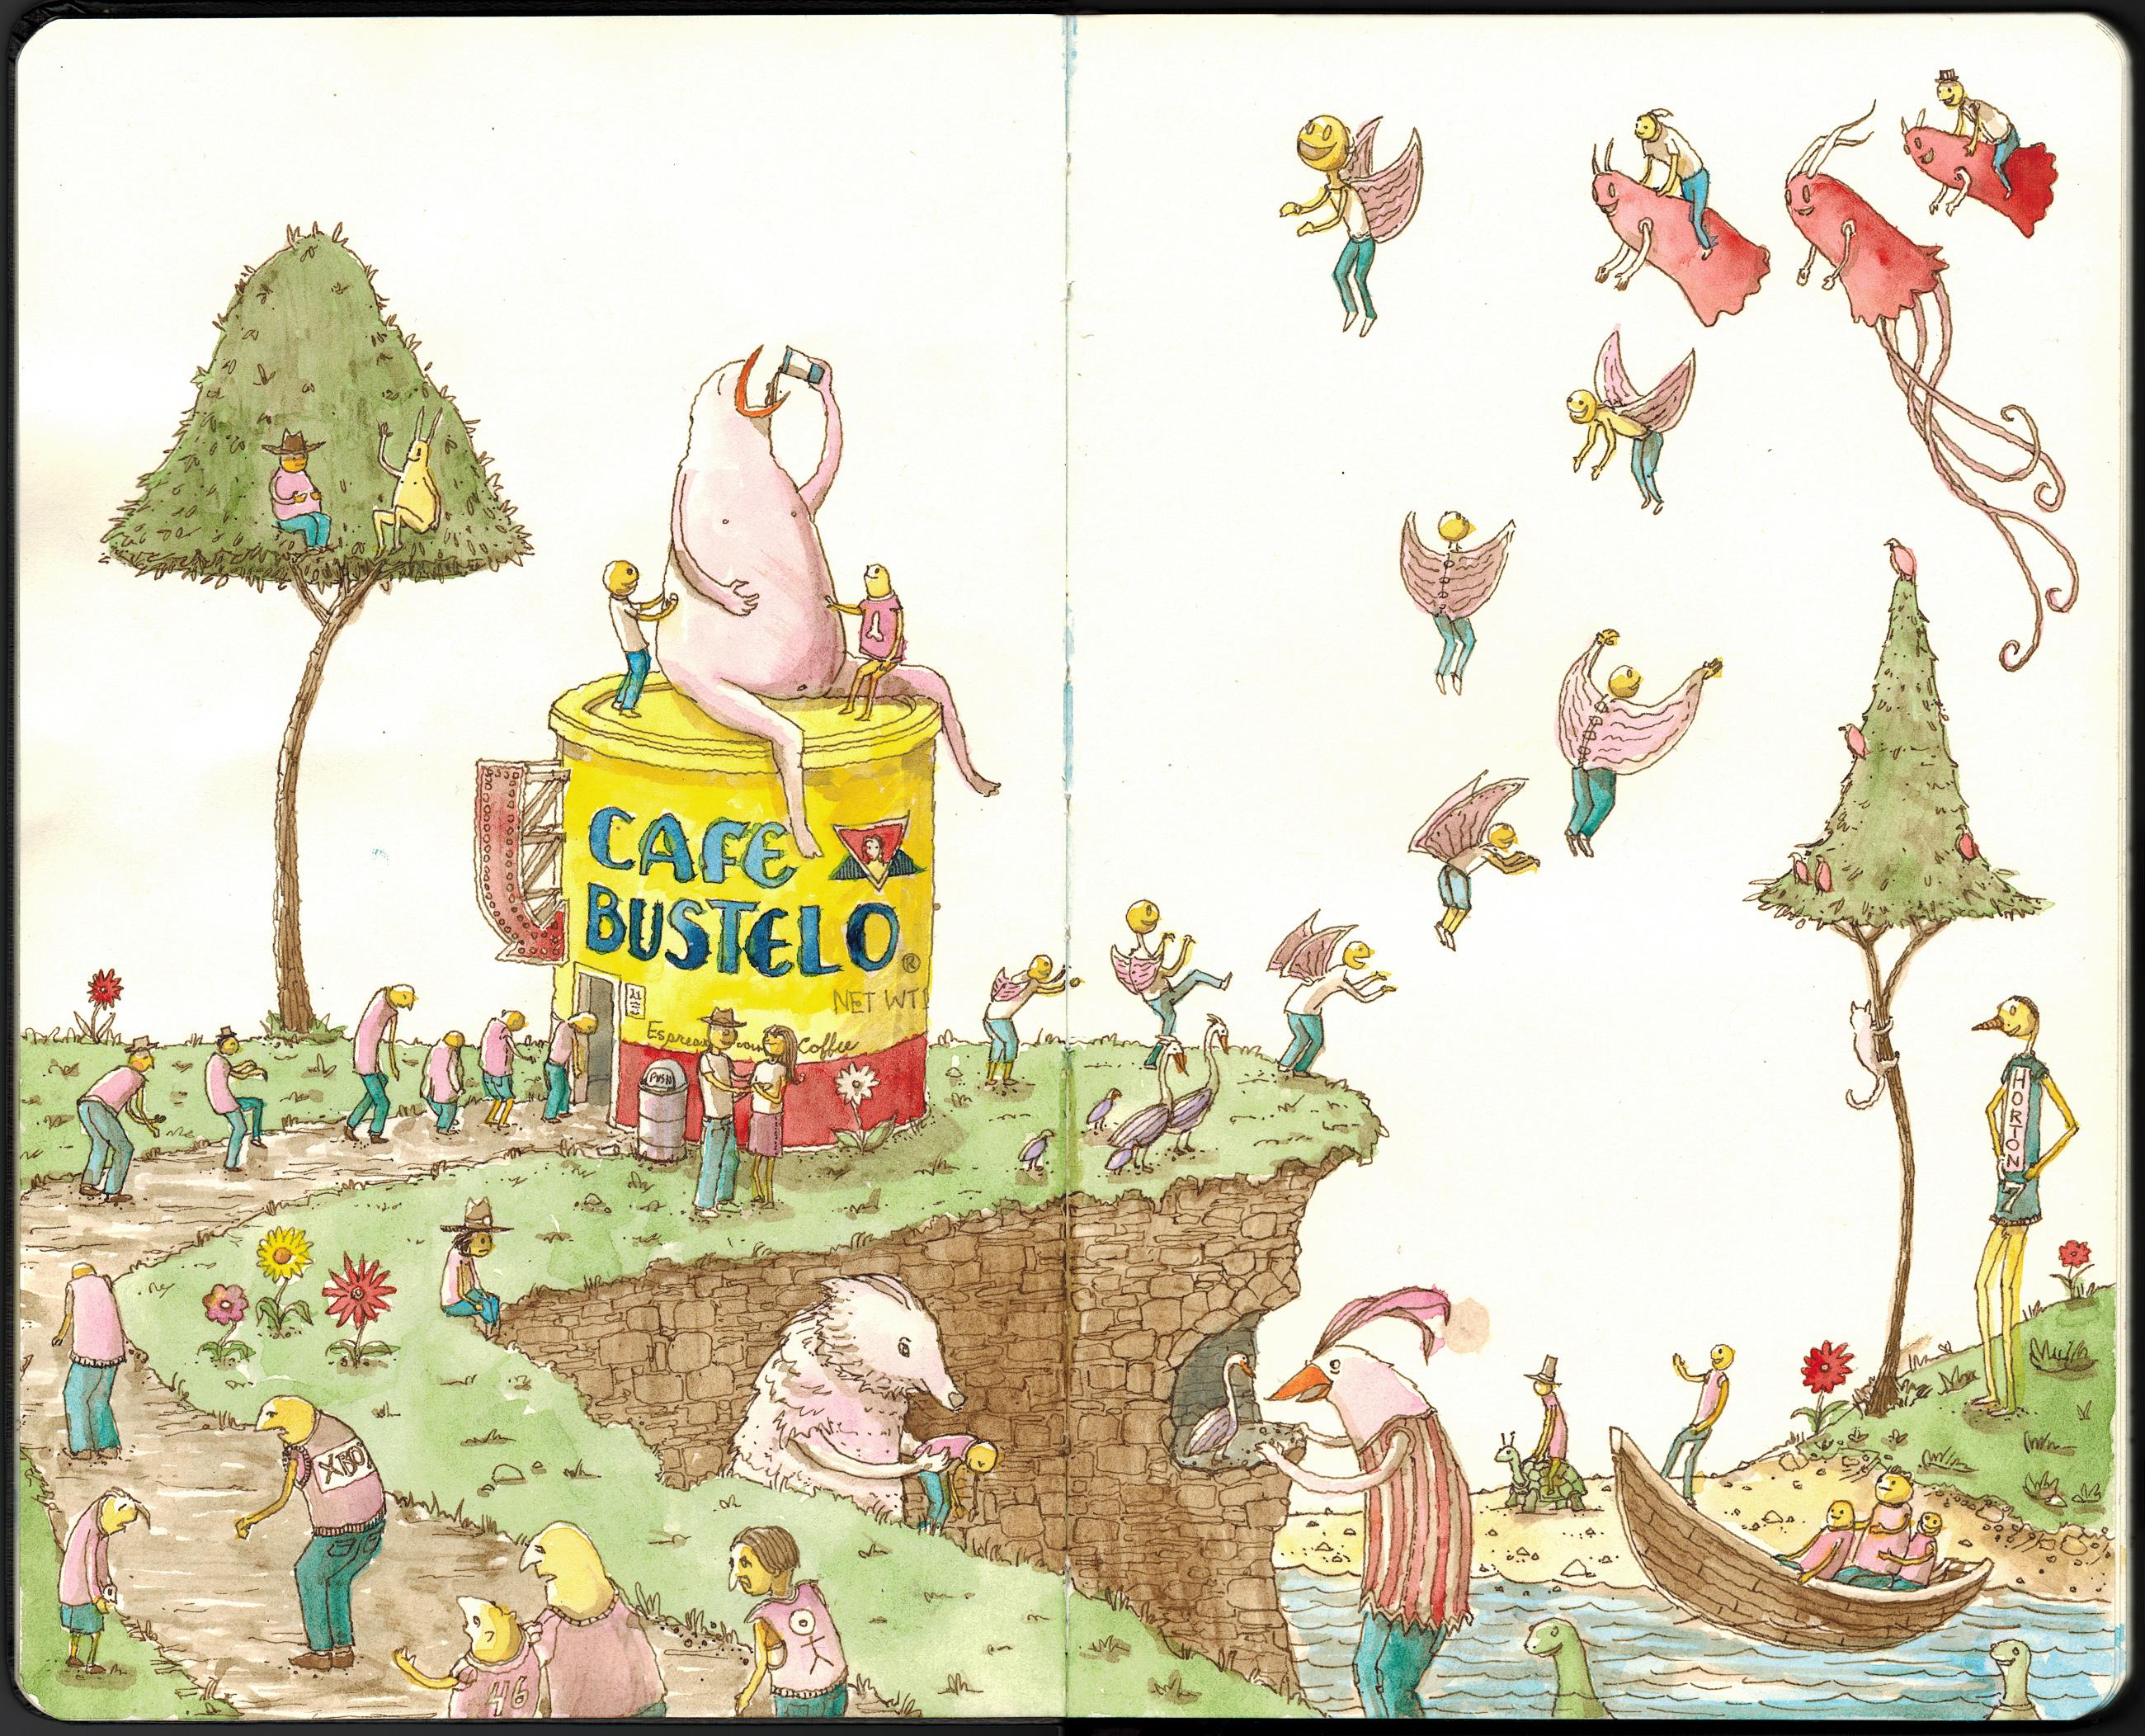 Cafe Bustelo (watercolor)